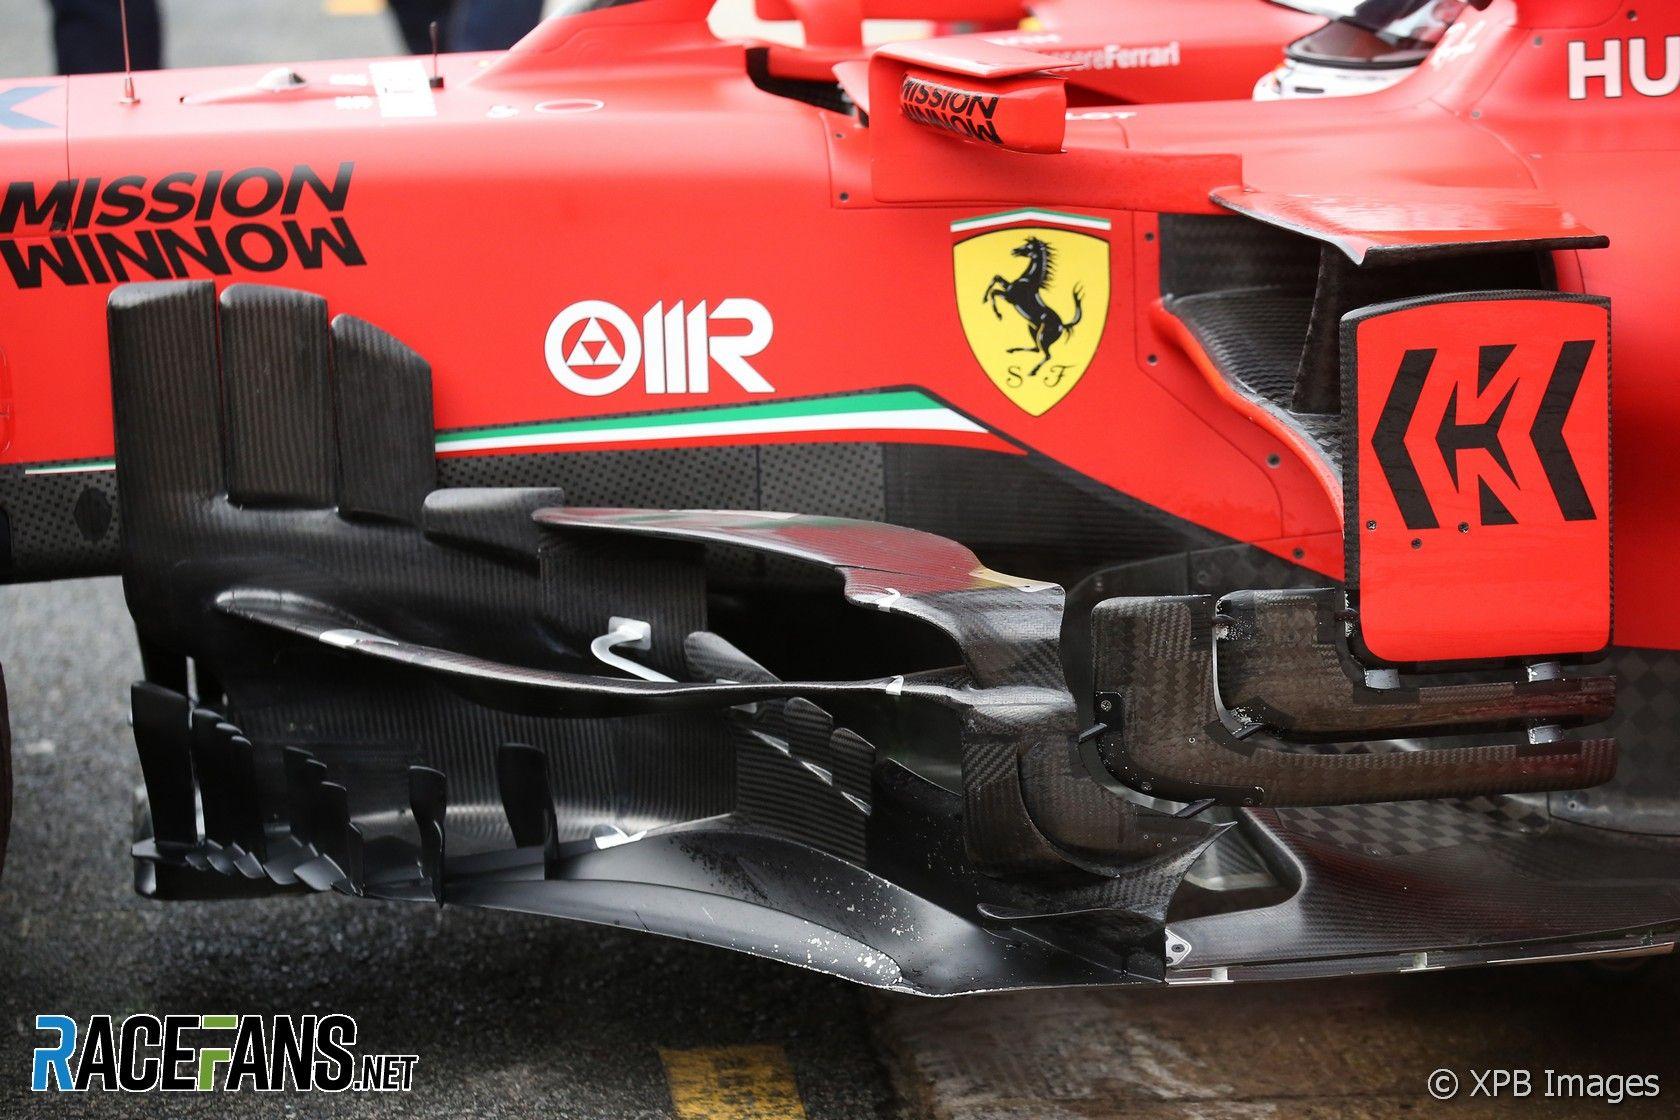 Pin by Ryoikeusa on Formula one in 2020   Ferrari, Barge, Formula one